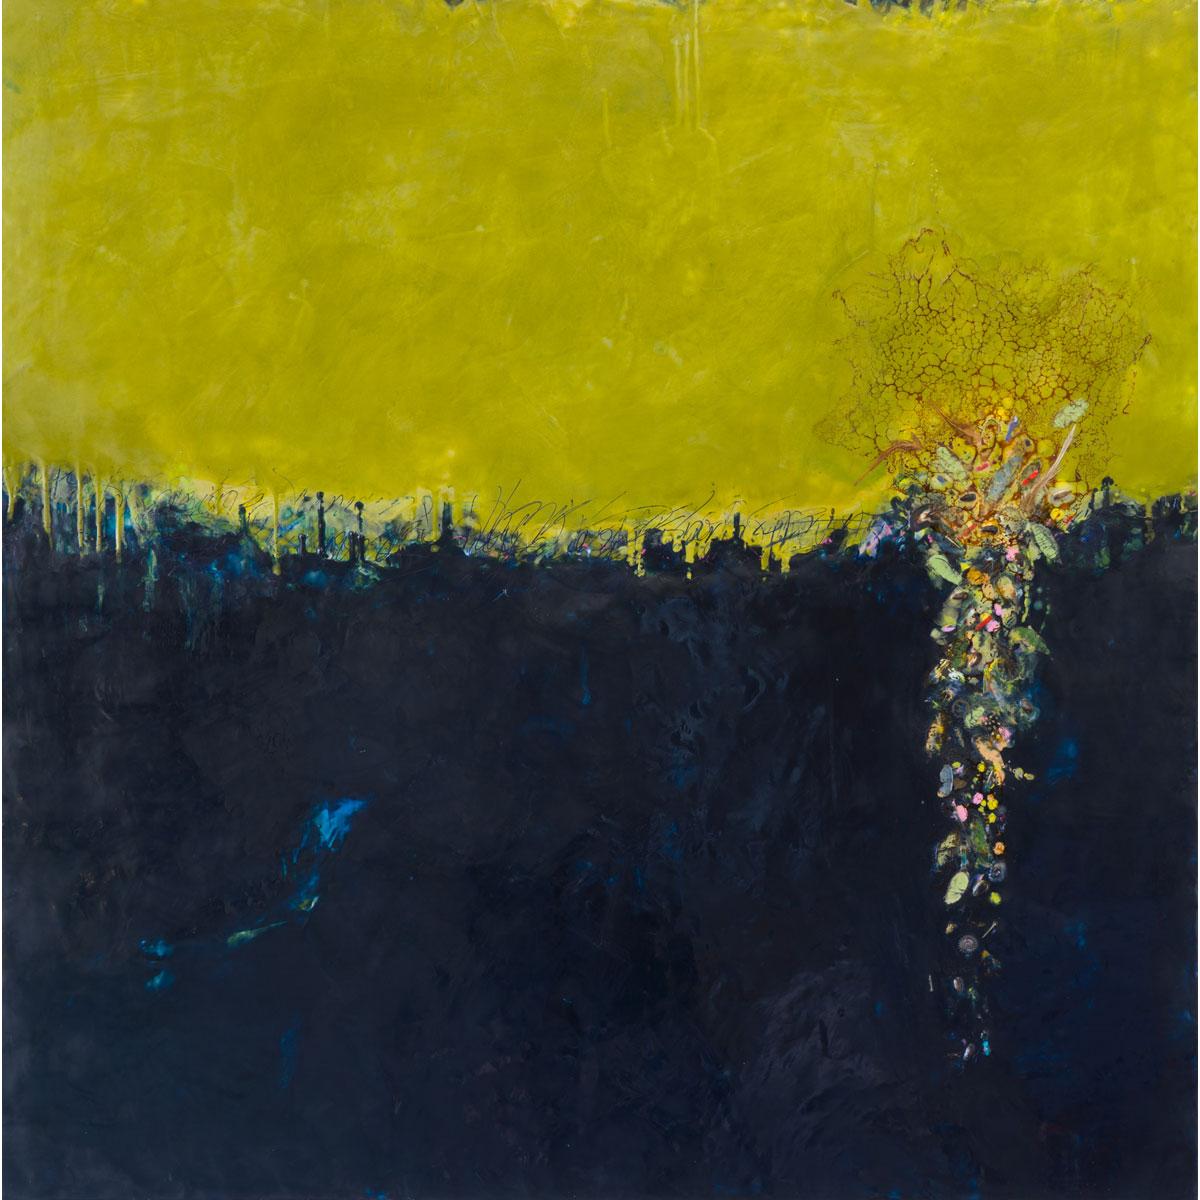 Inevitability Of Spring by Pamela Gibson